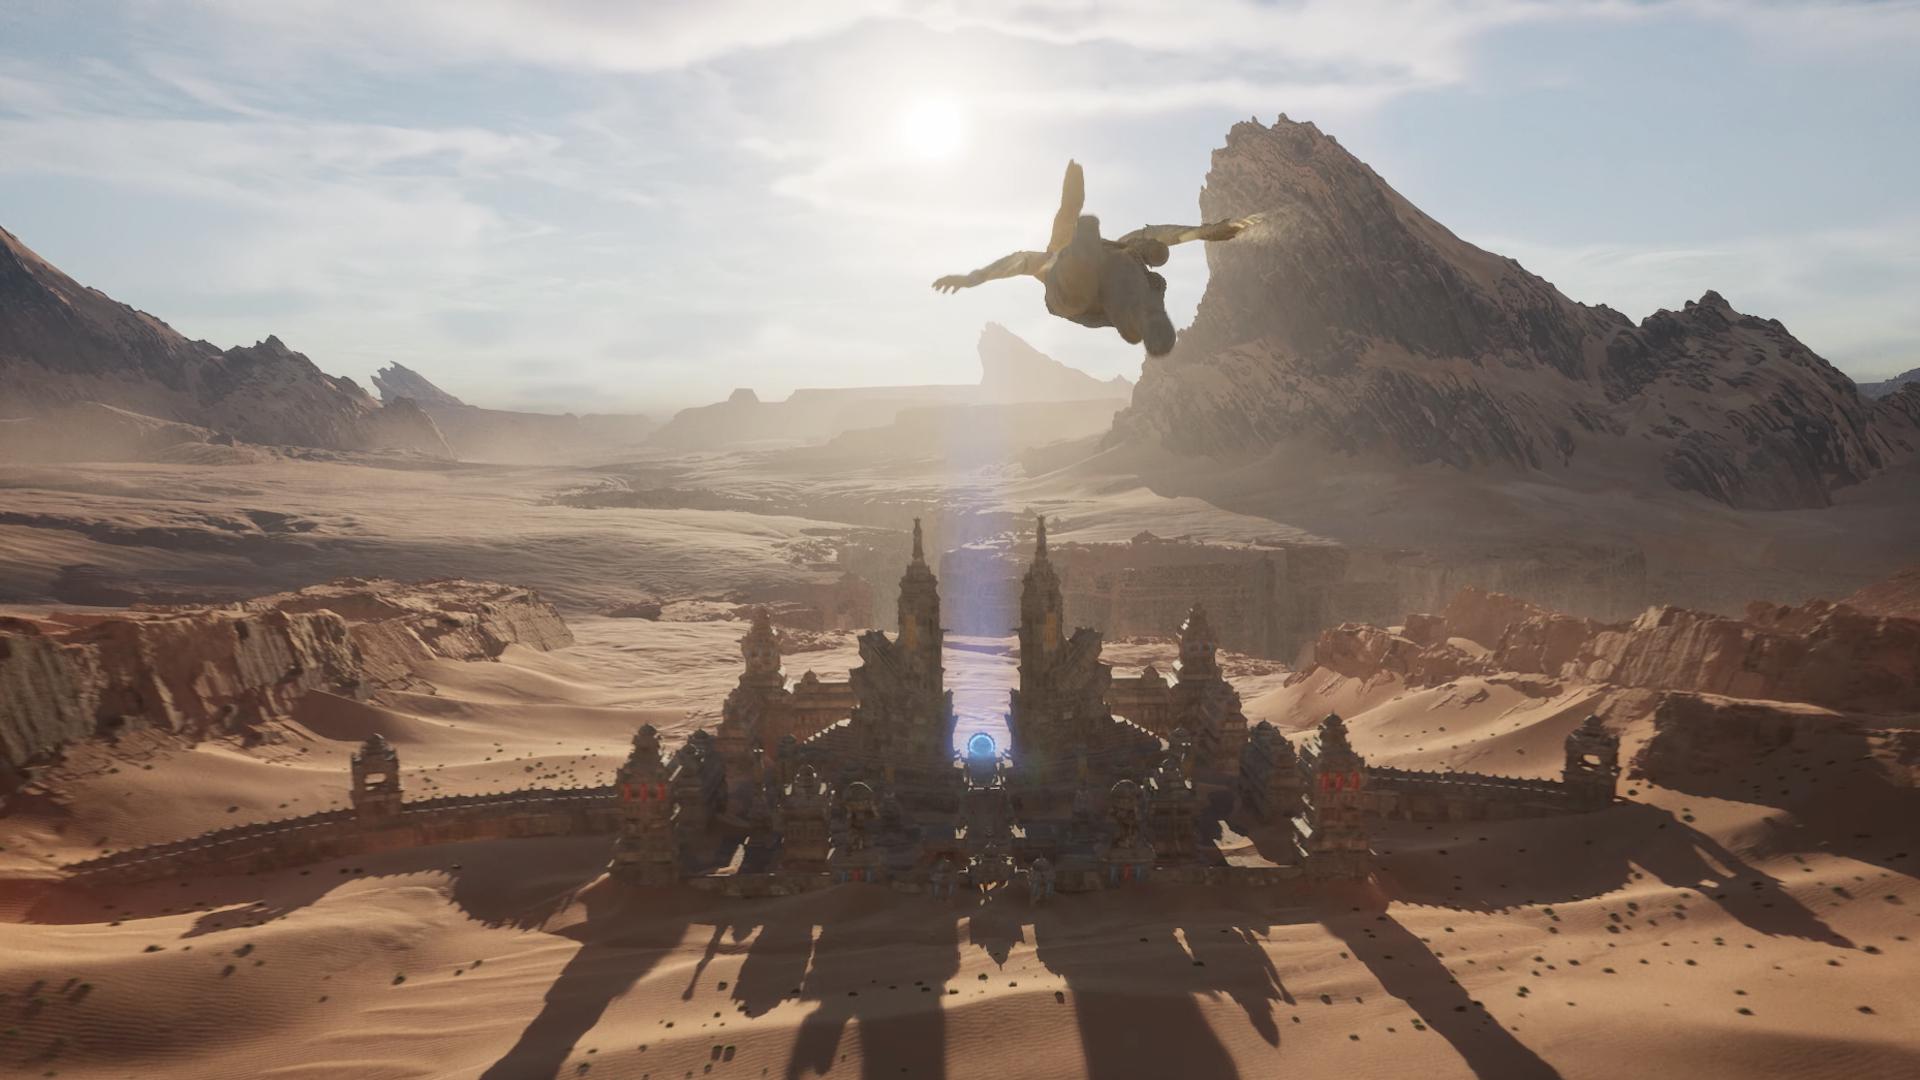 Epic Games: گرافیک بازیها در نسل بعد سینمایی و کاملا واقع گرایانه خواهد بود